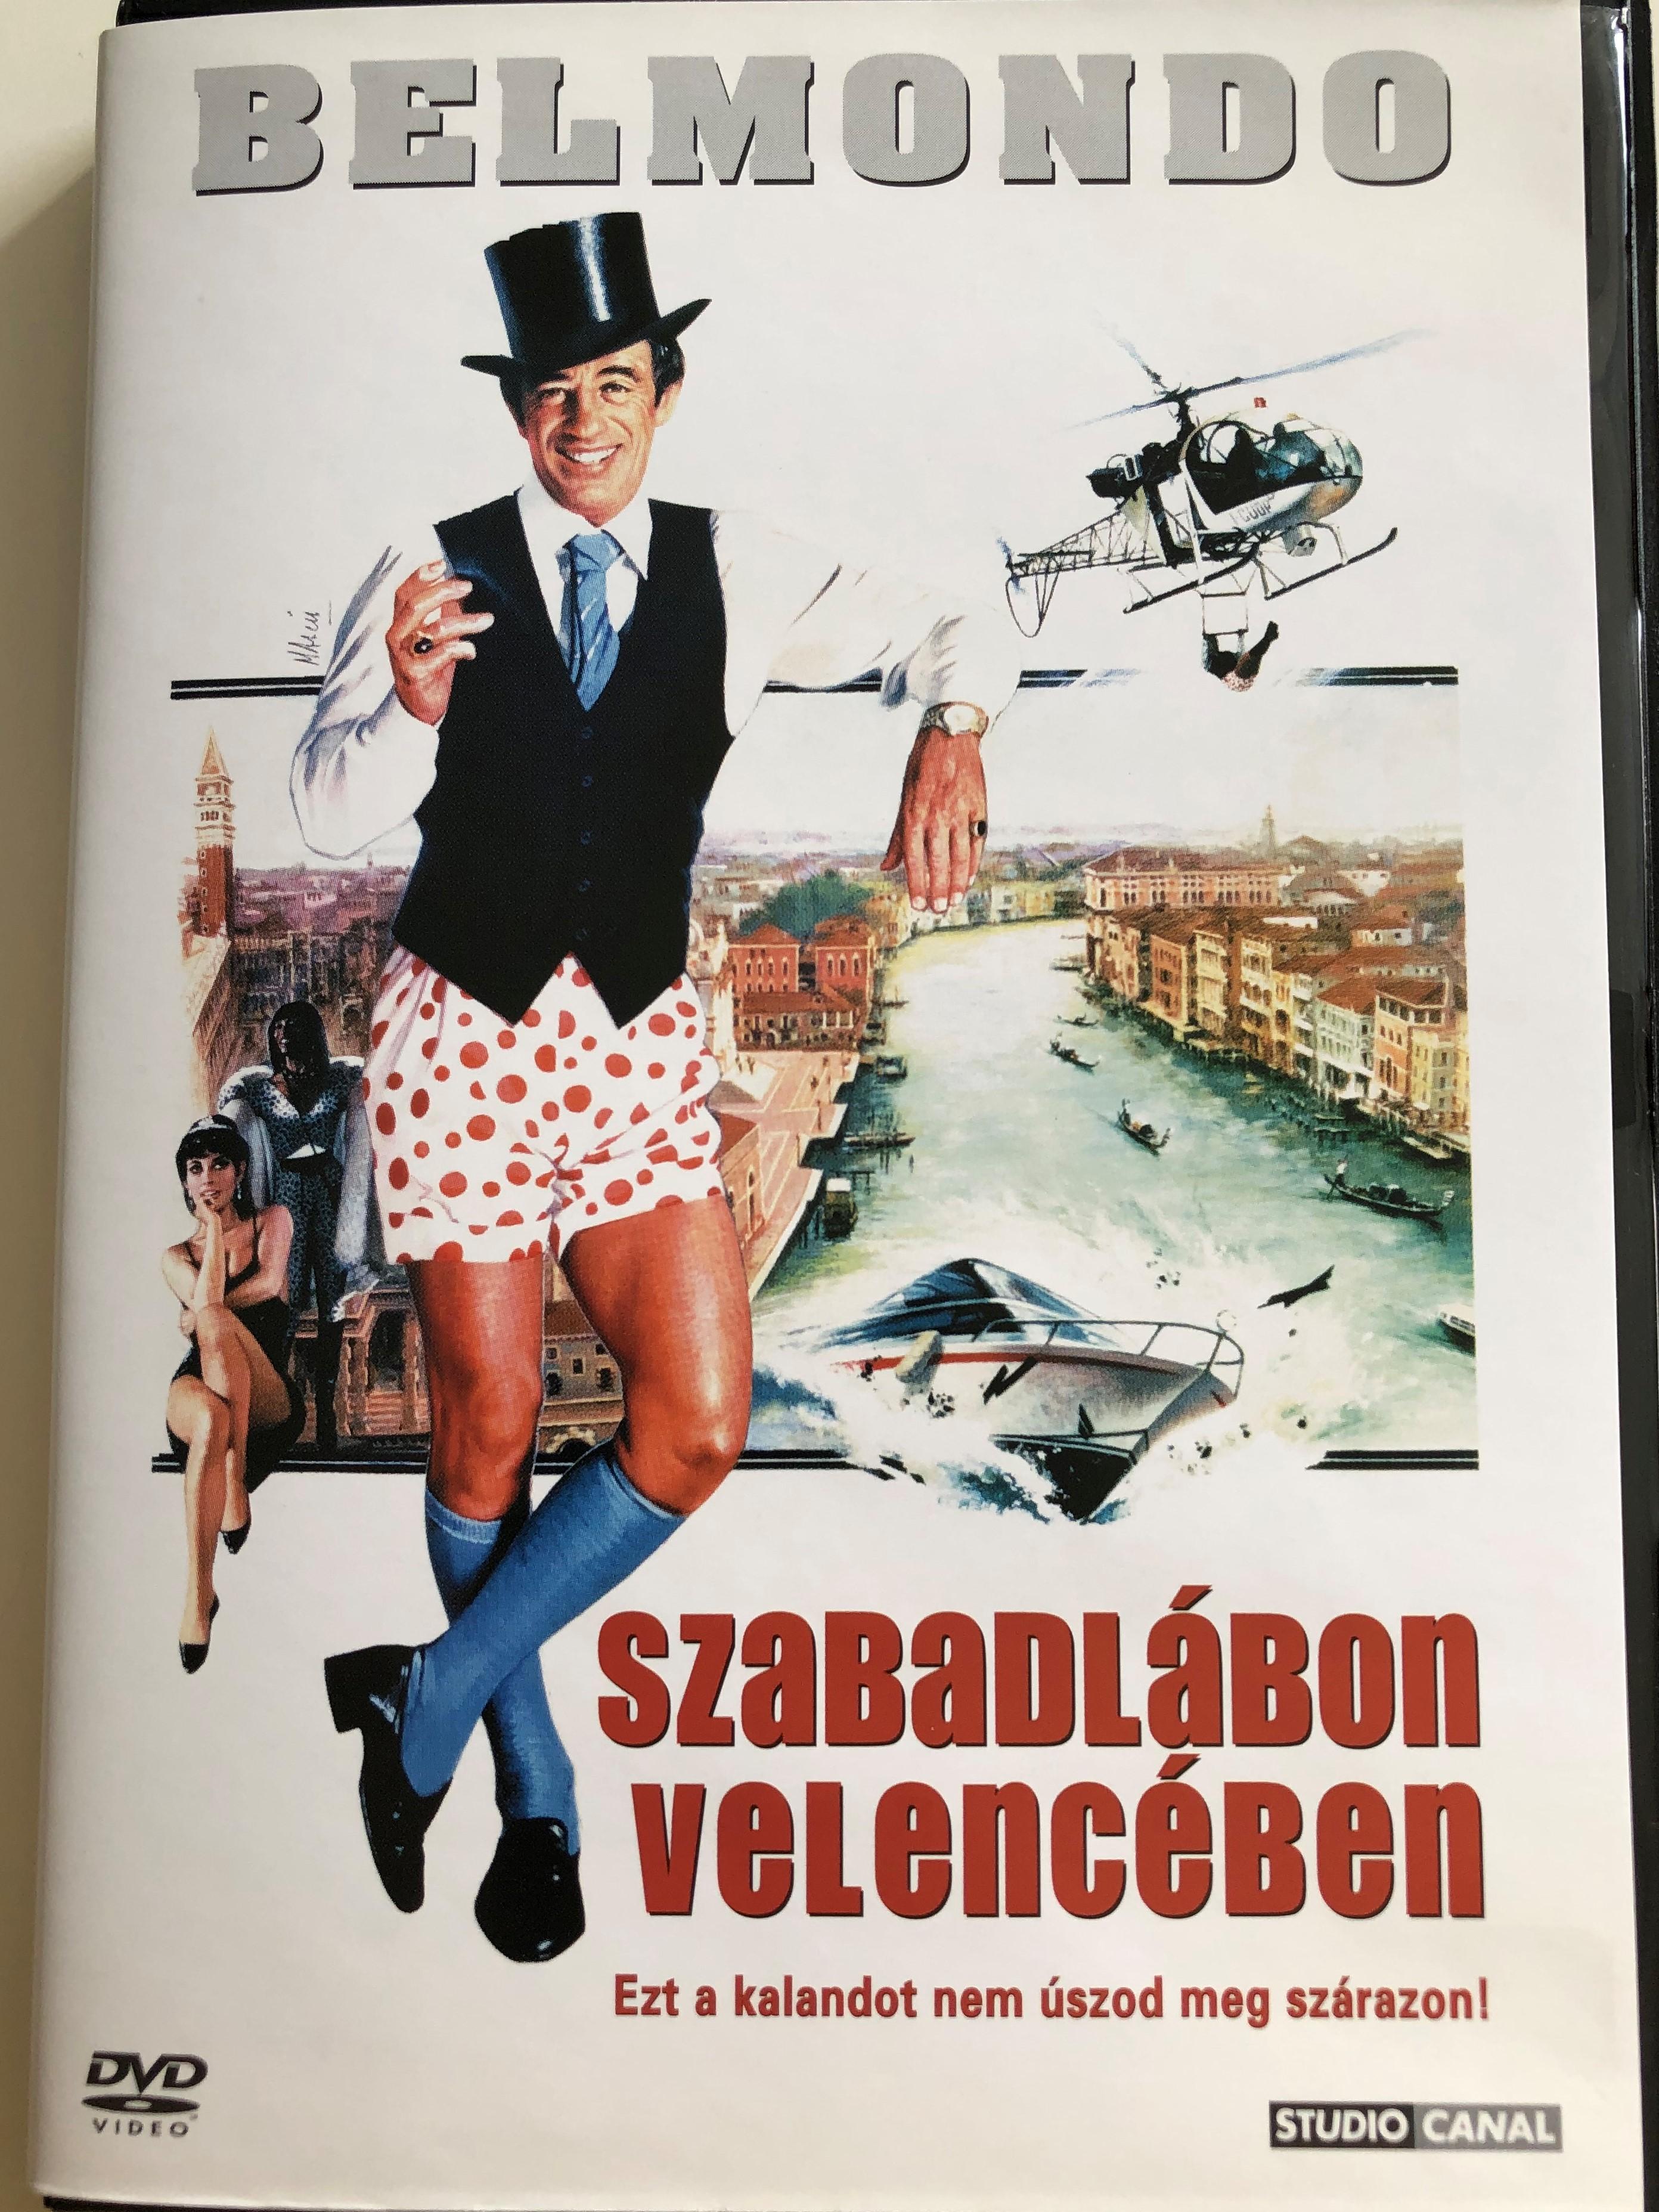 le-guignolo-dvd-1979-szabadl-bon-velenc-ben-directed-by-georges-lautner-starring-jean-paul-belmondo-michel-galabru-charles-gerard-georges-geret-1-.jpg